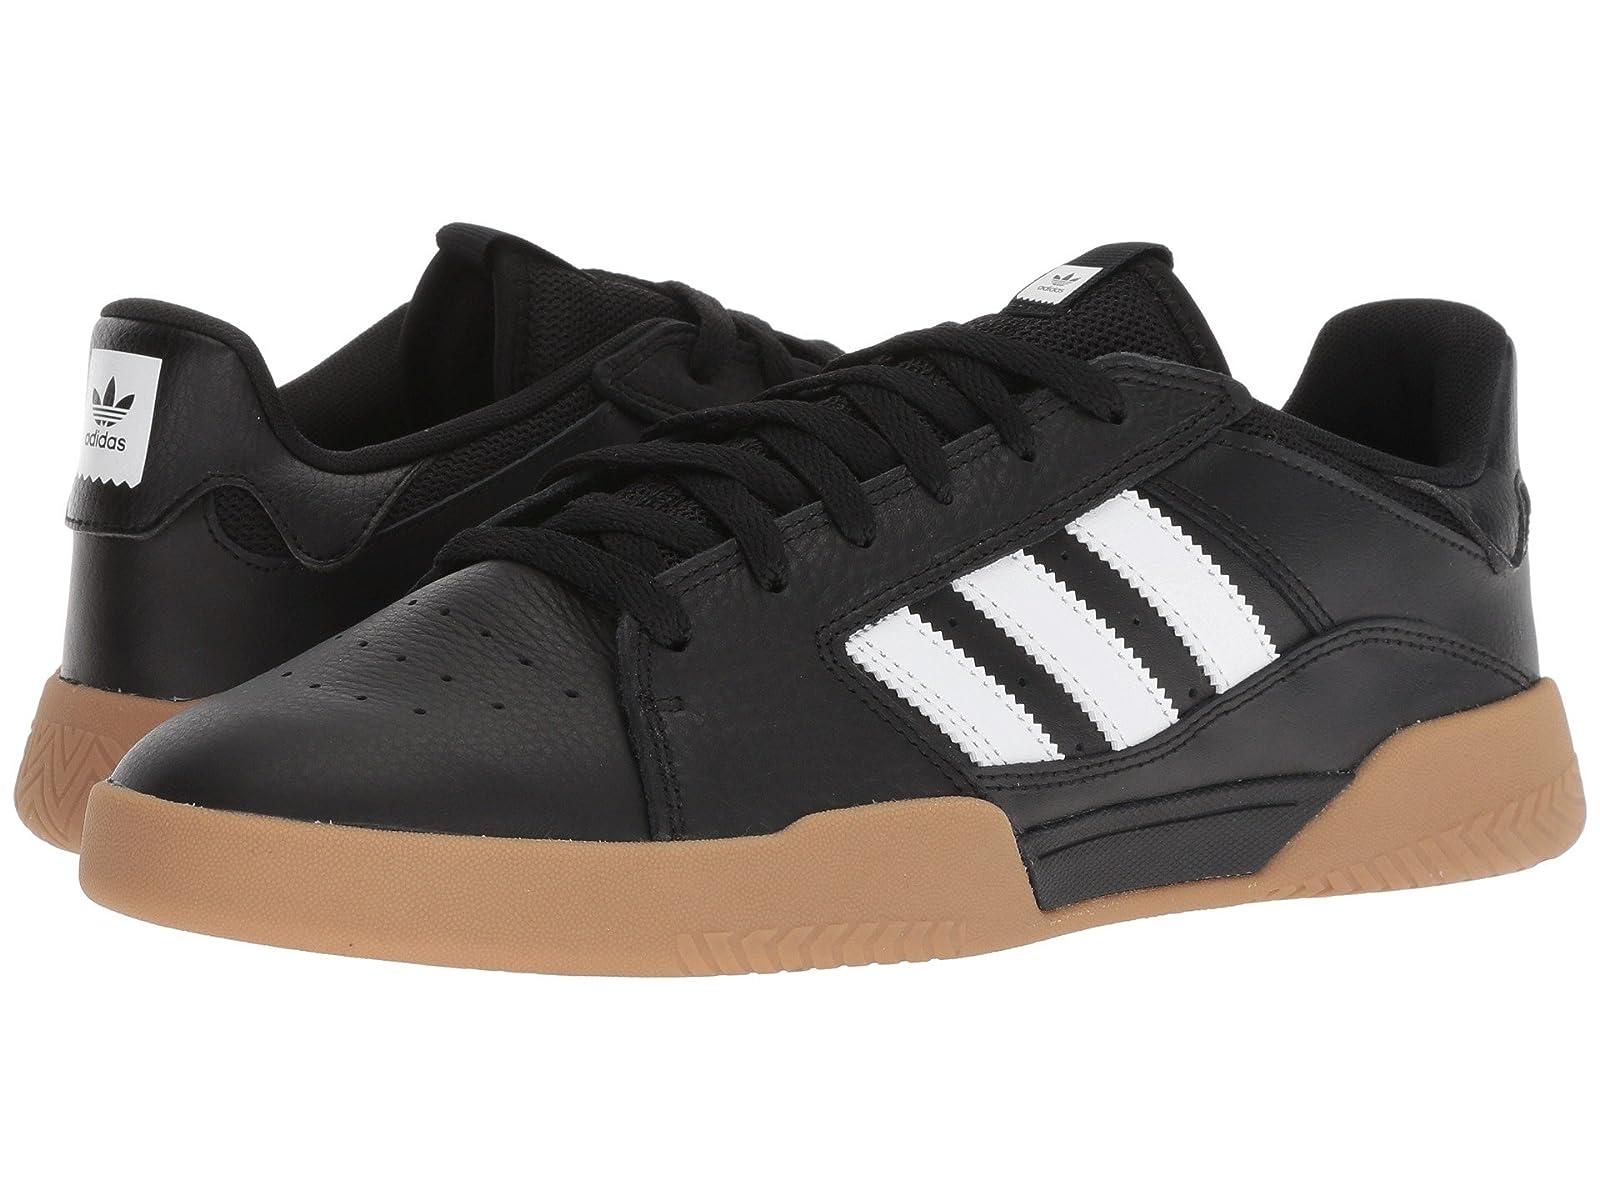 adidas Skateboarding VRX LowAtmospheric grades have affordable shoes